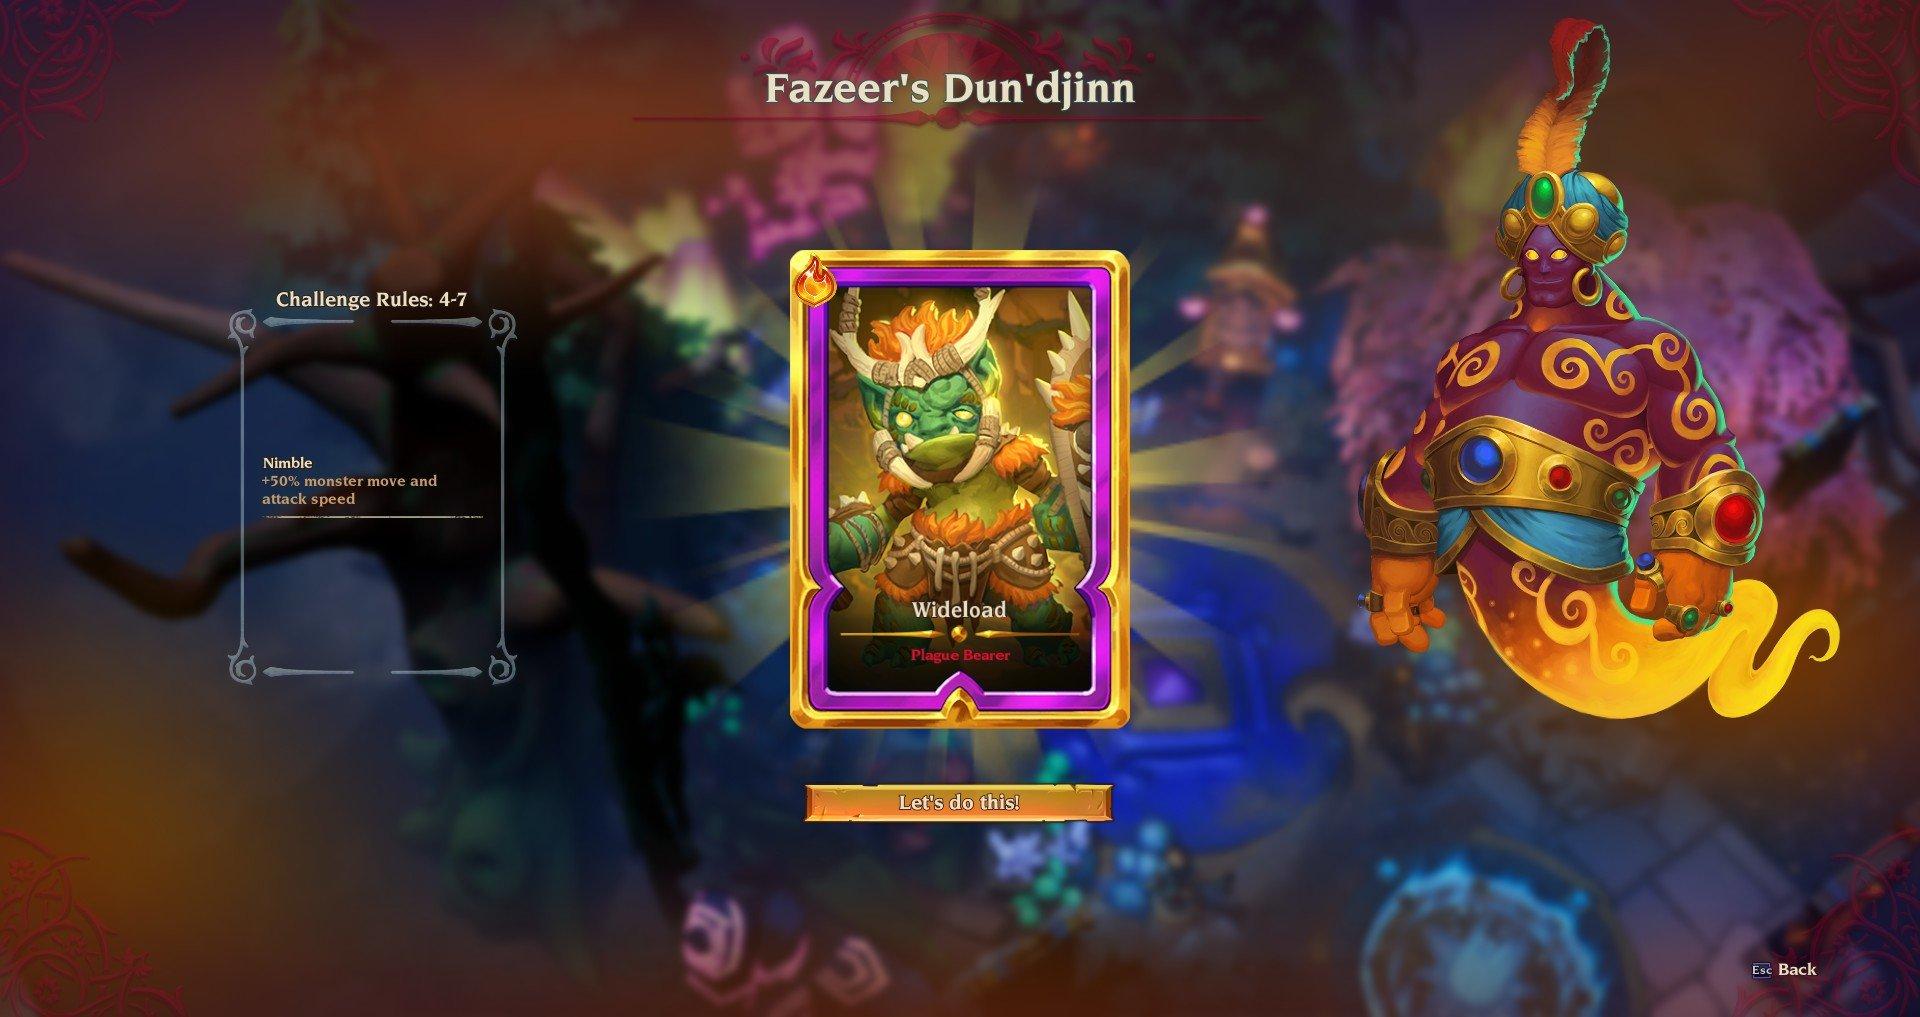 Torchlight 3 endgame Dun'djinn di Fazeer il genio